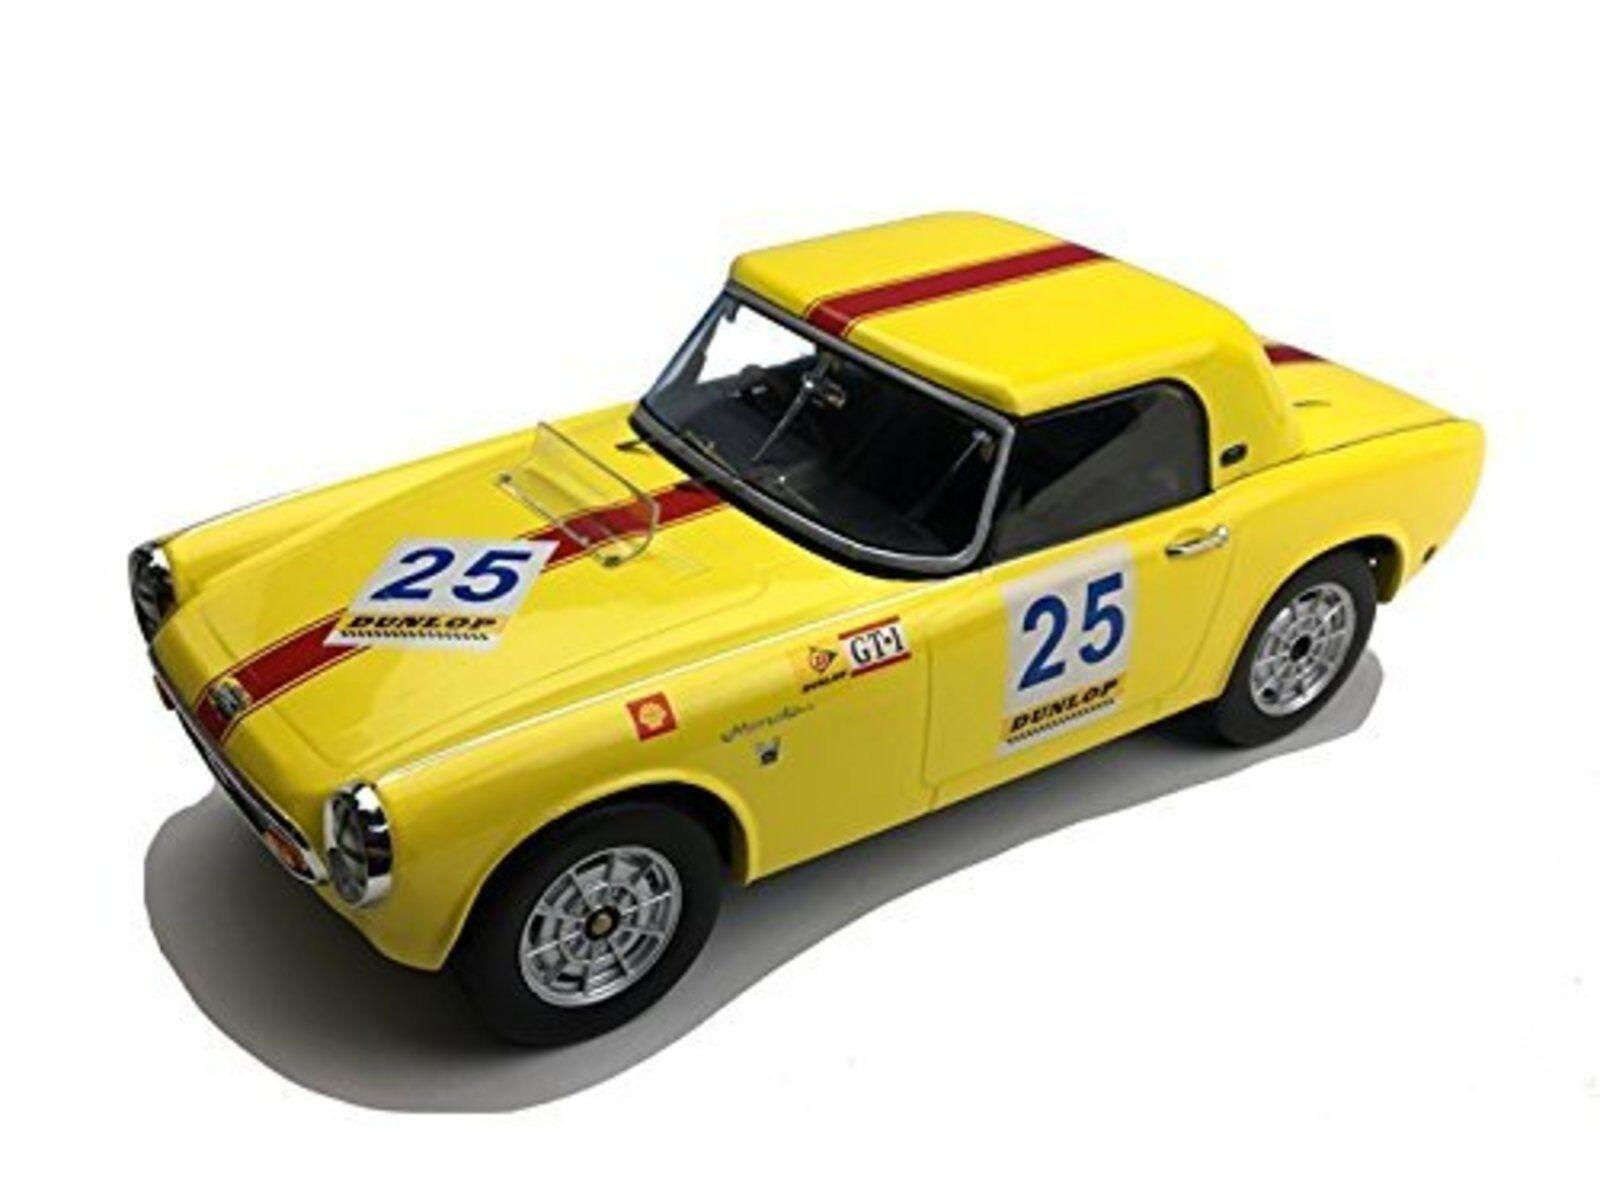 PREMIER  18 1 18 HONDA S800 RACING 1968 Suzuka 12 H Diecast Model F18-015 F S